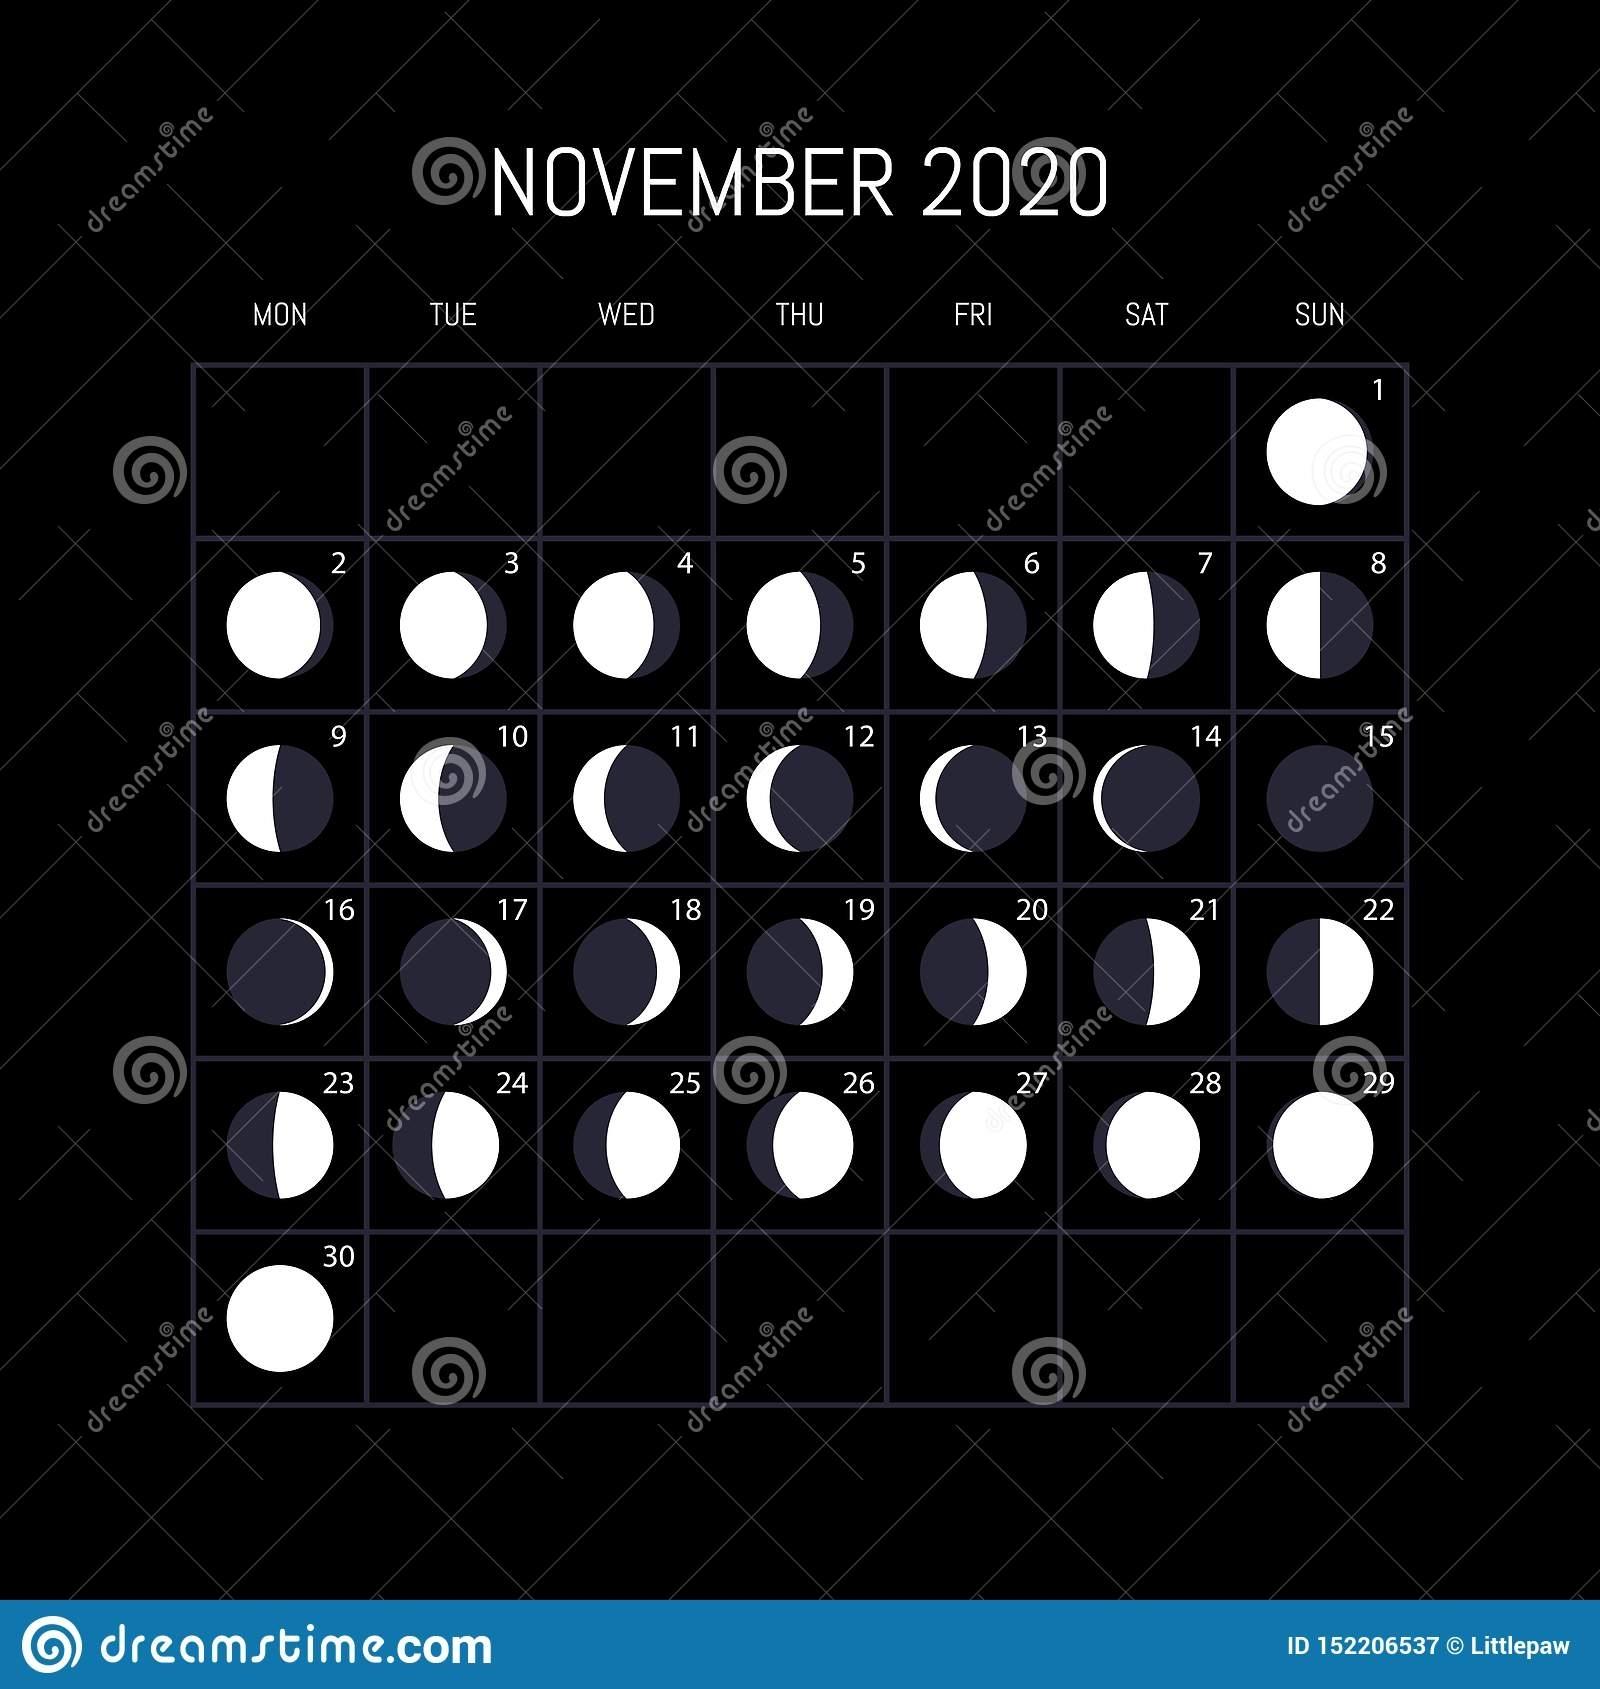 Moon Phases Calendar For 2020 Year. November. Night